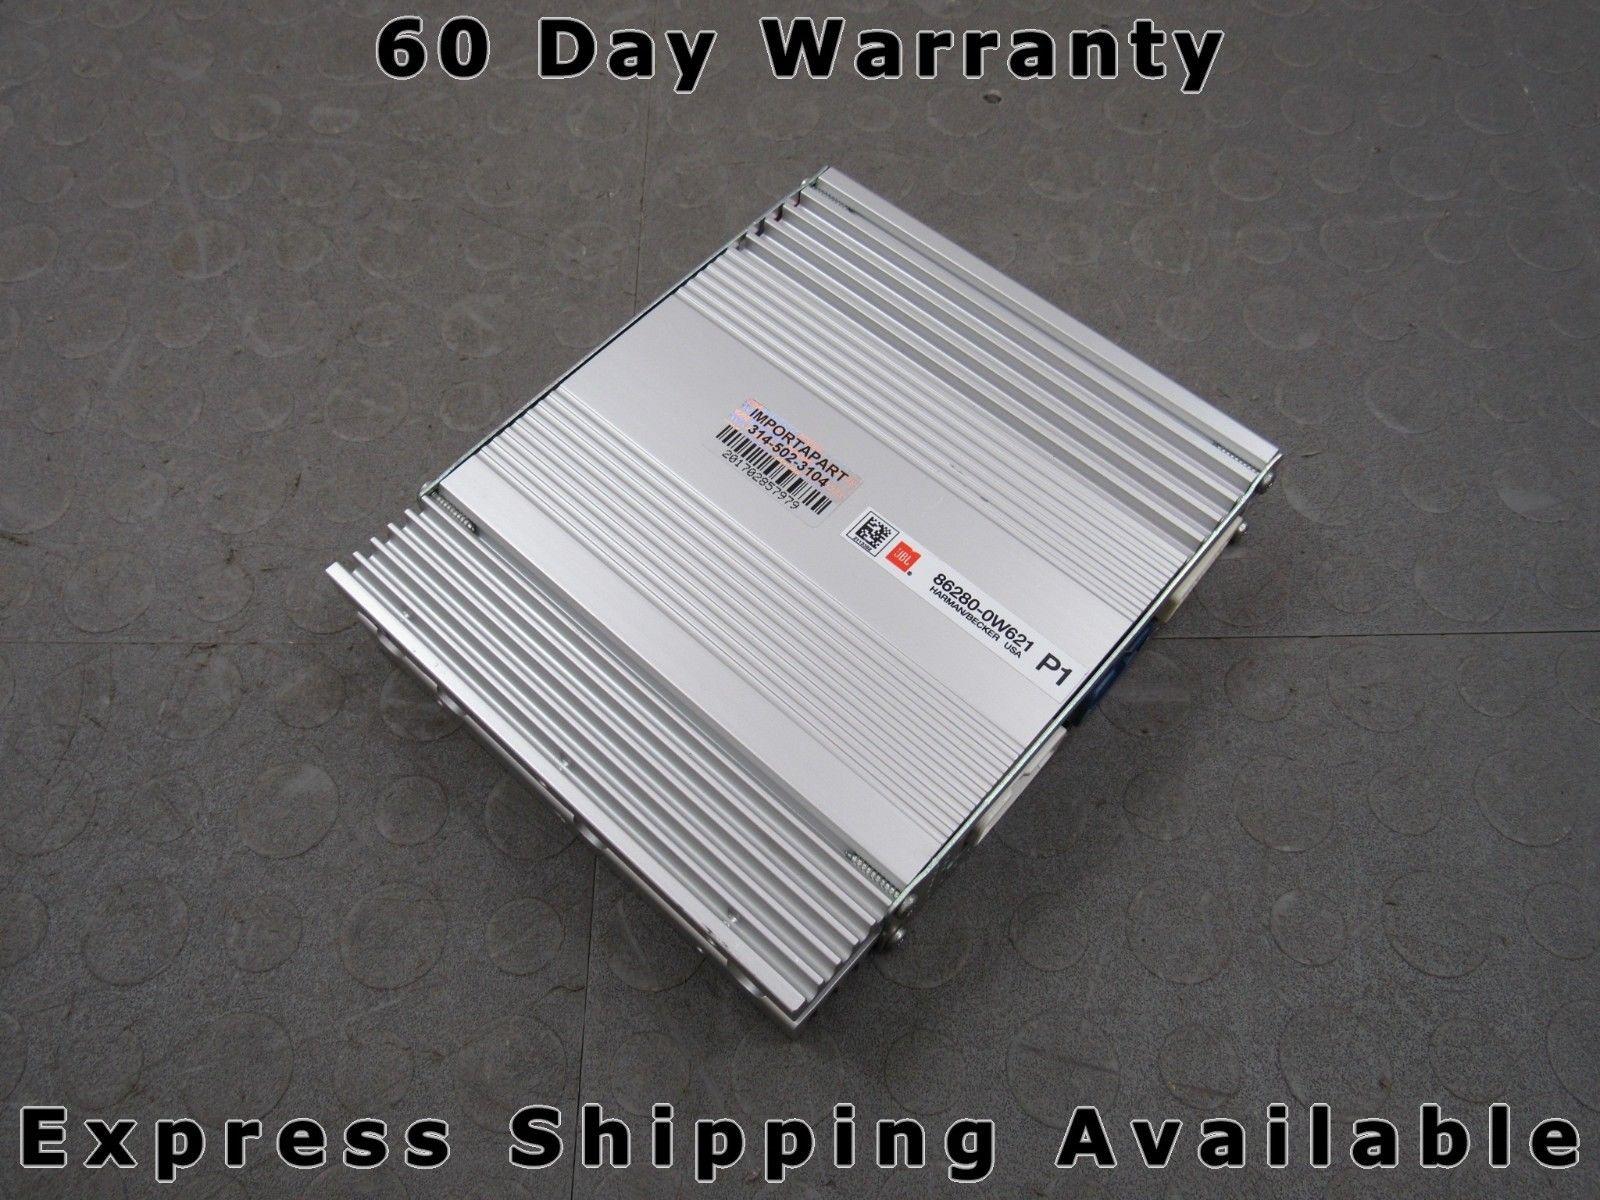 10-11 Prius JBL Harman/Becker Audio Radio Stereo Amplifier Amp 86280-0W621 C